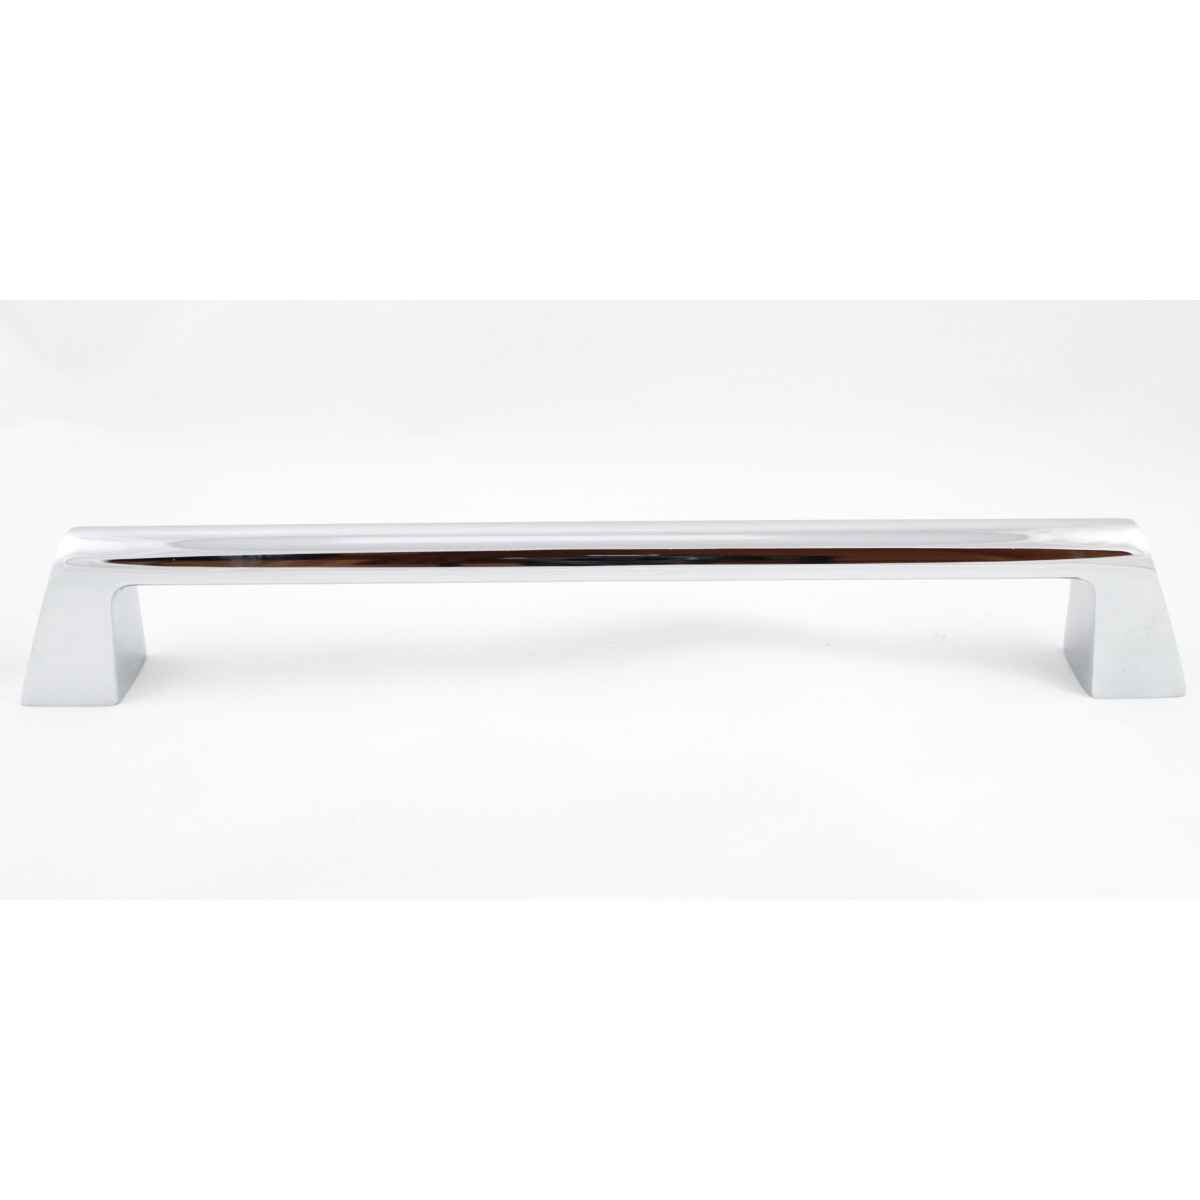 Ручка-Скоба Modda 192 Латунь Хром Diva-810-08-192